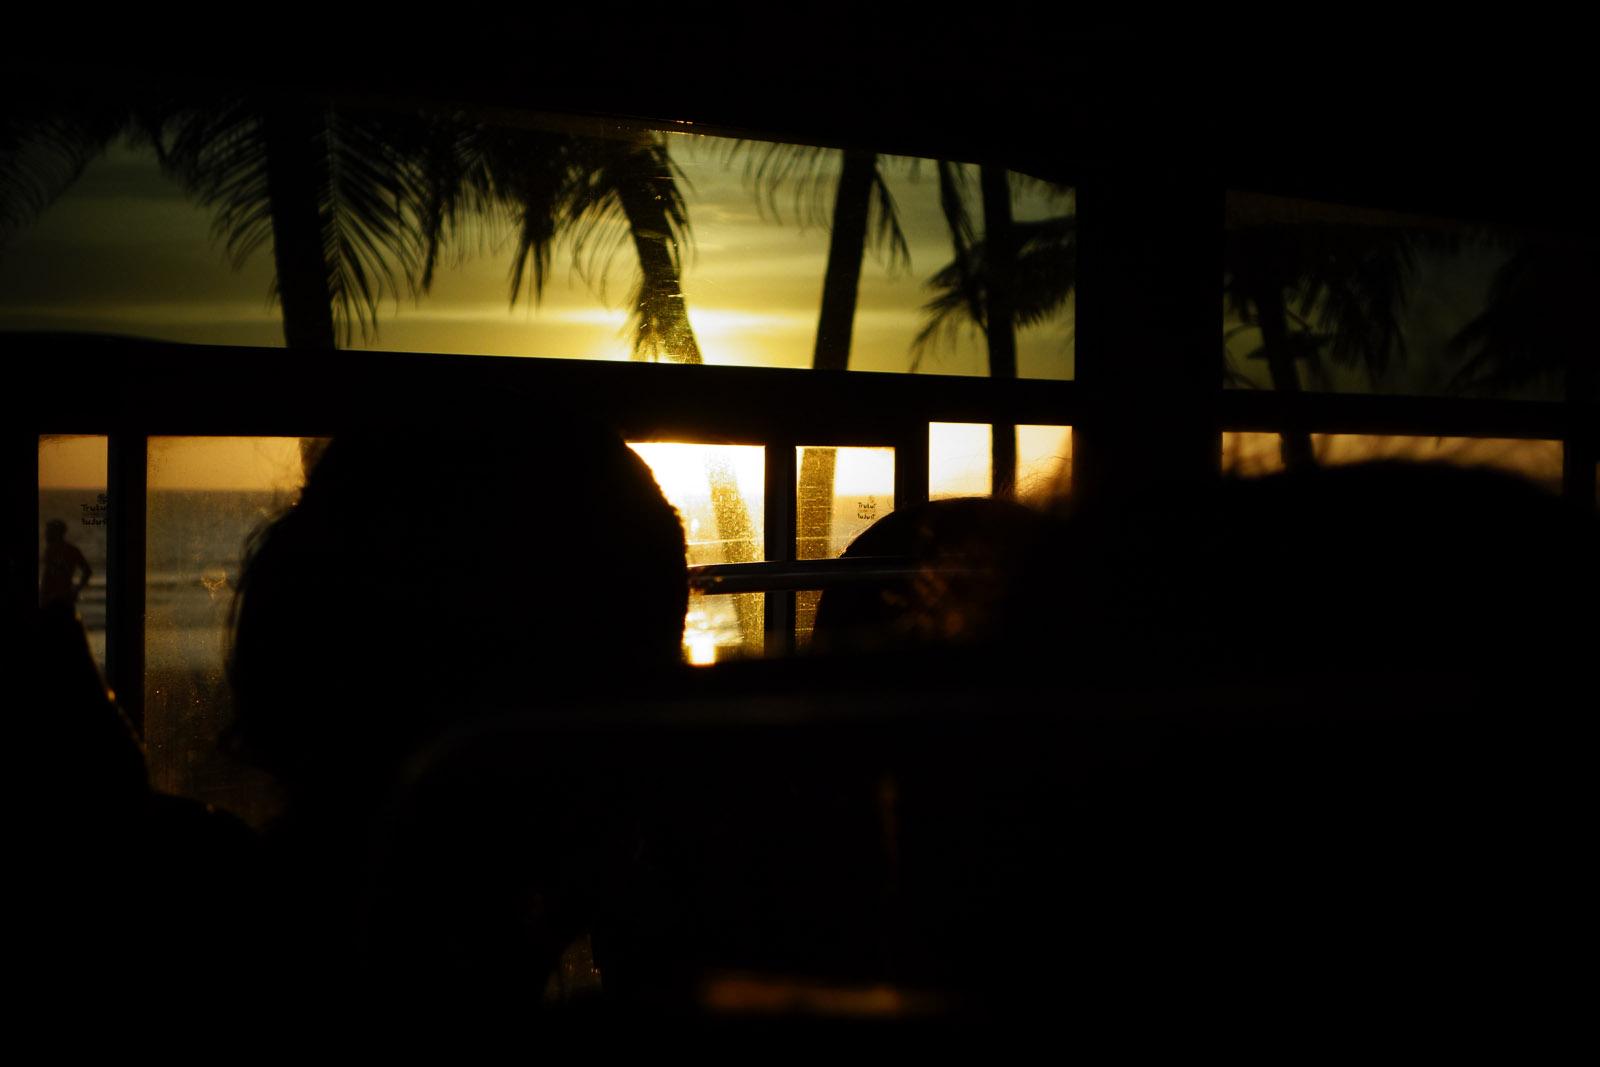 Sunshinestories-surf-travel-blog-DSC03528